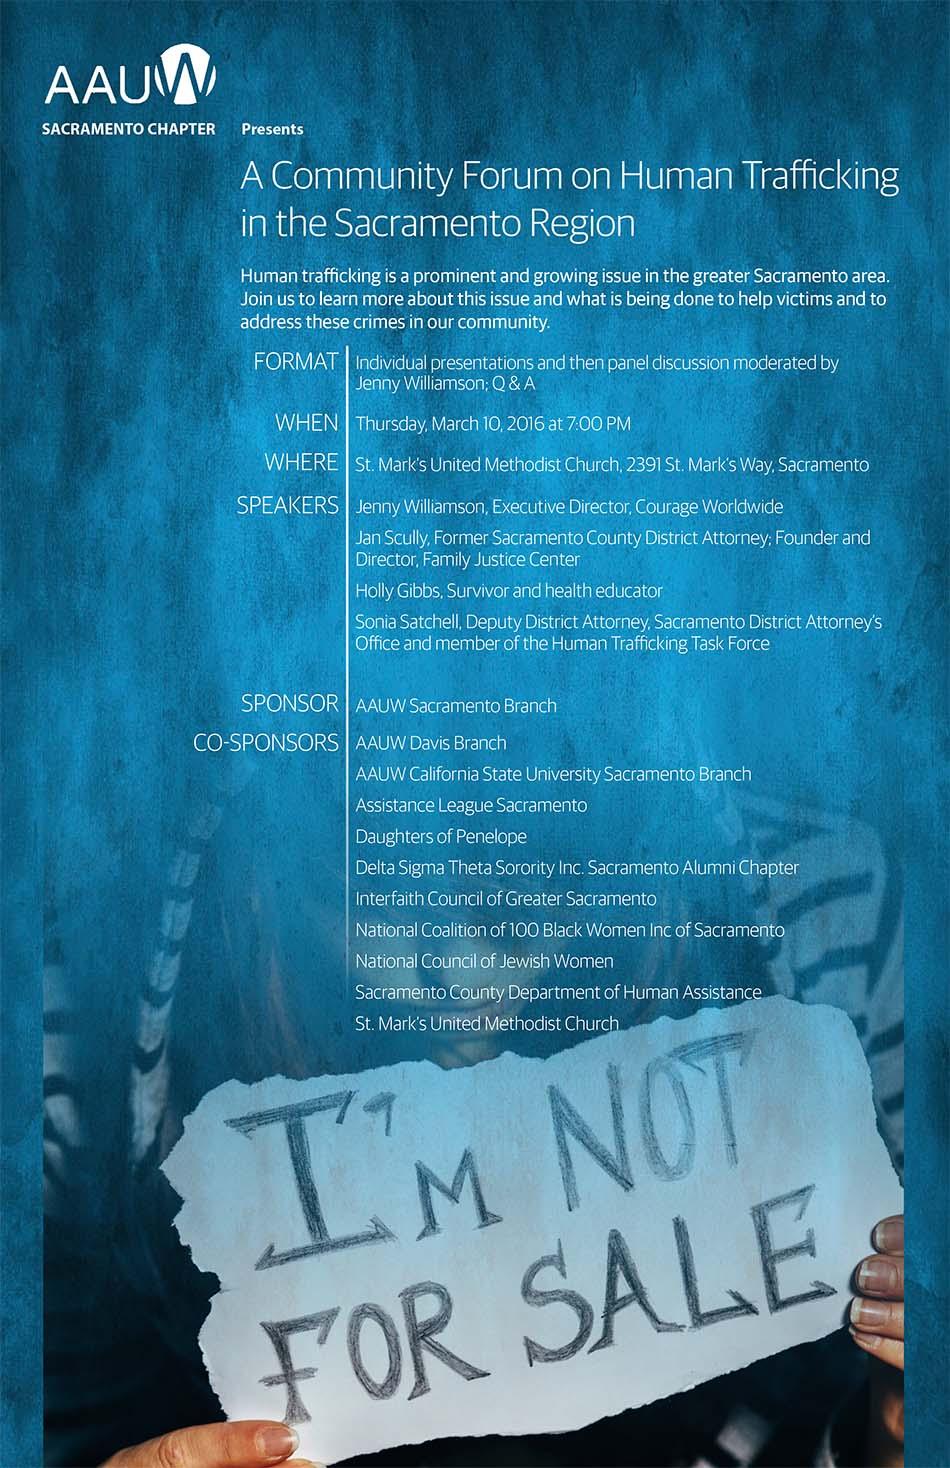 A Community Forum on Human Trafficking in the Sacramento Region